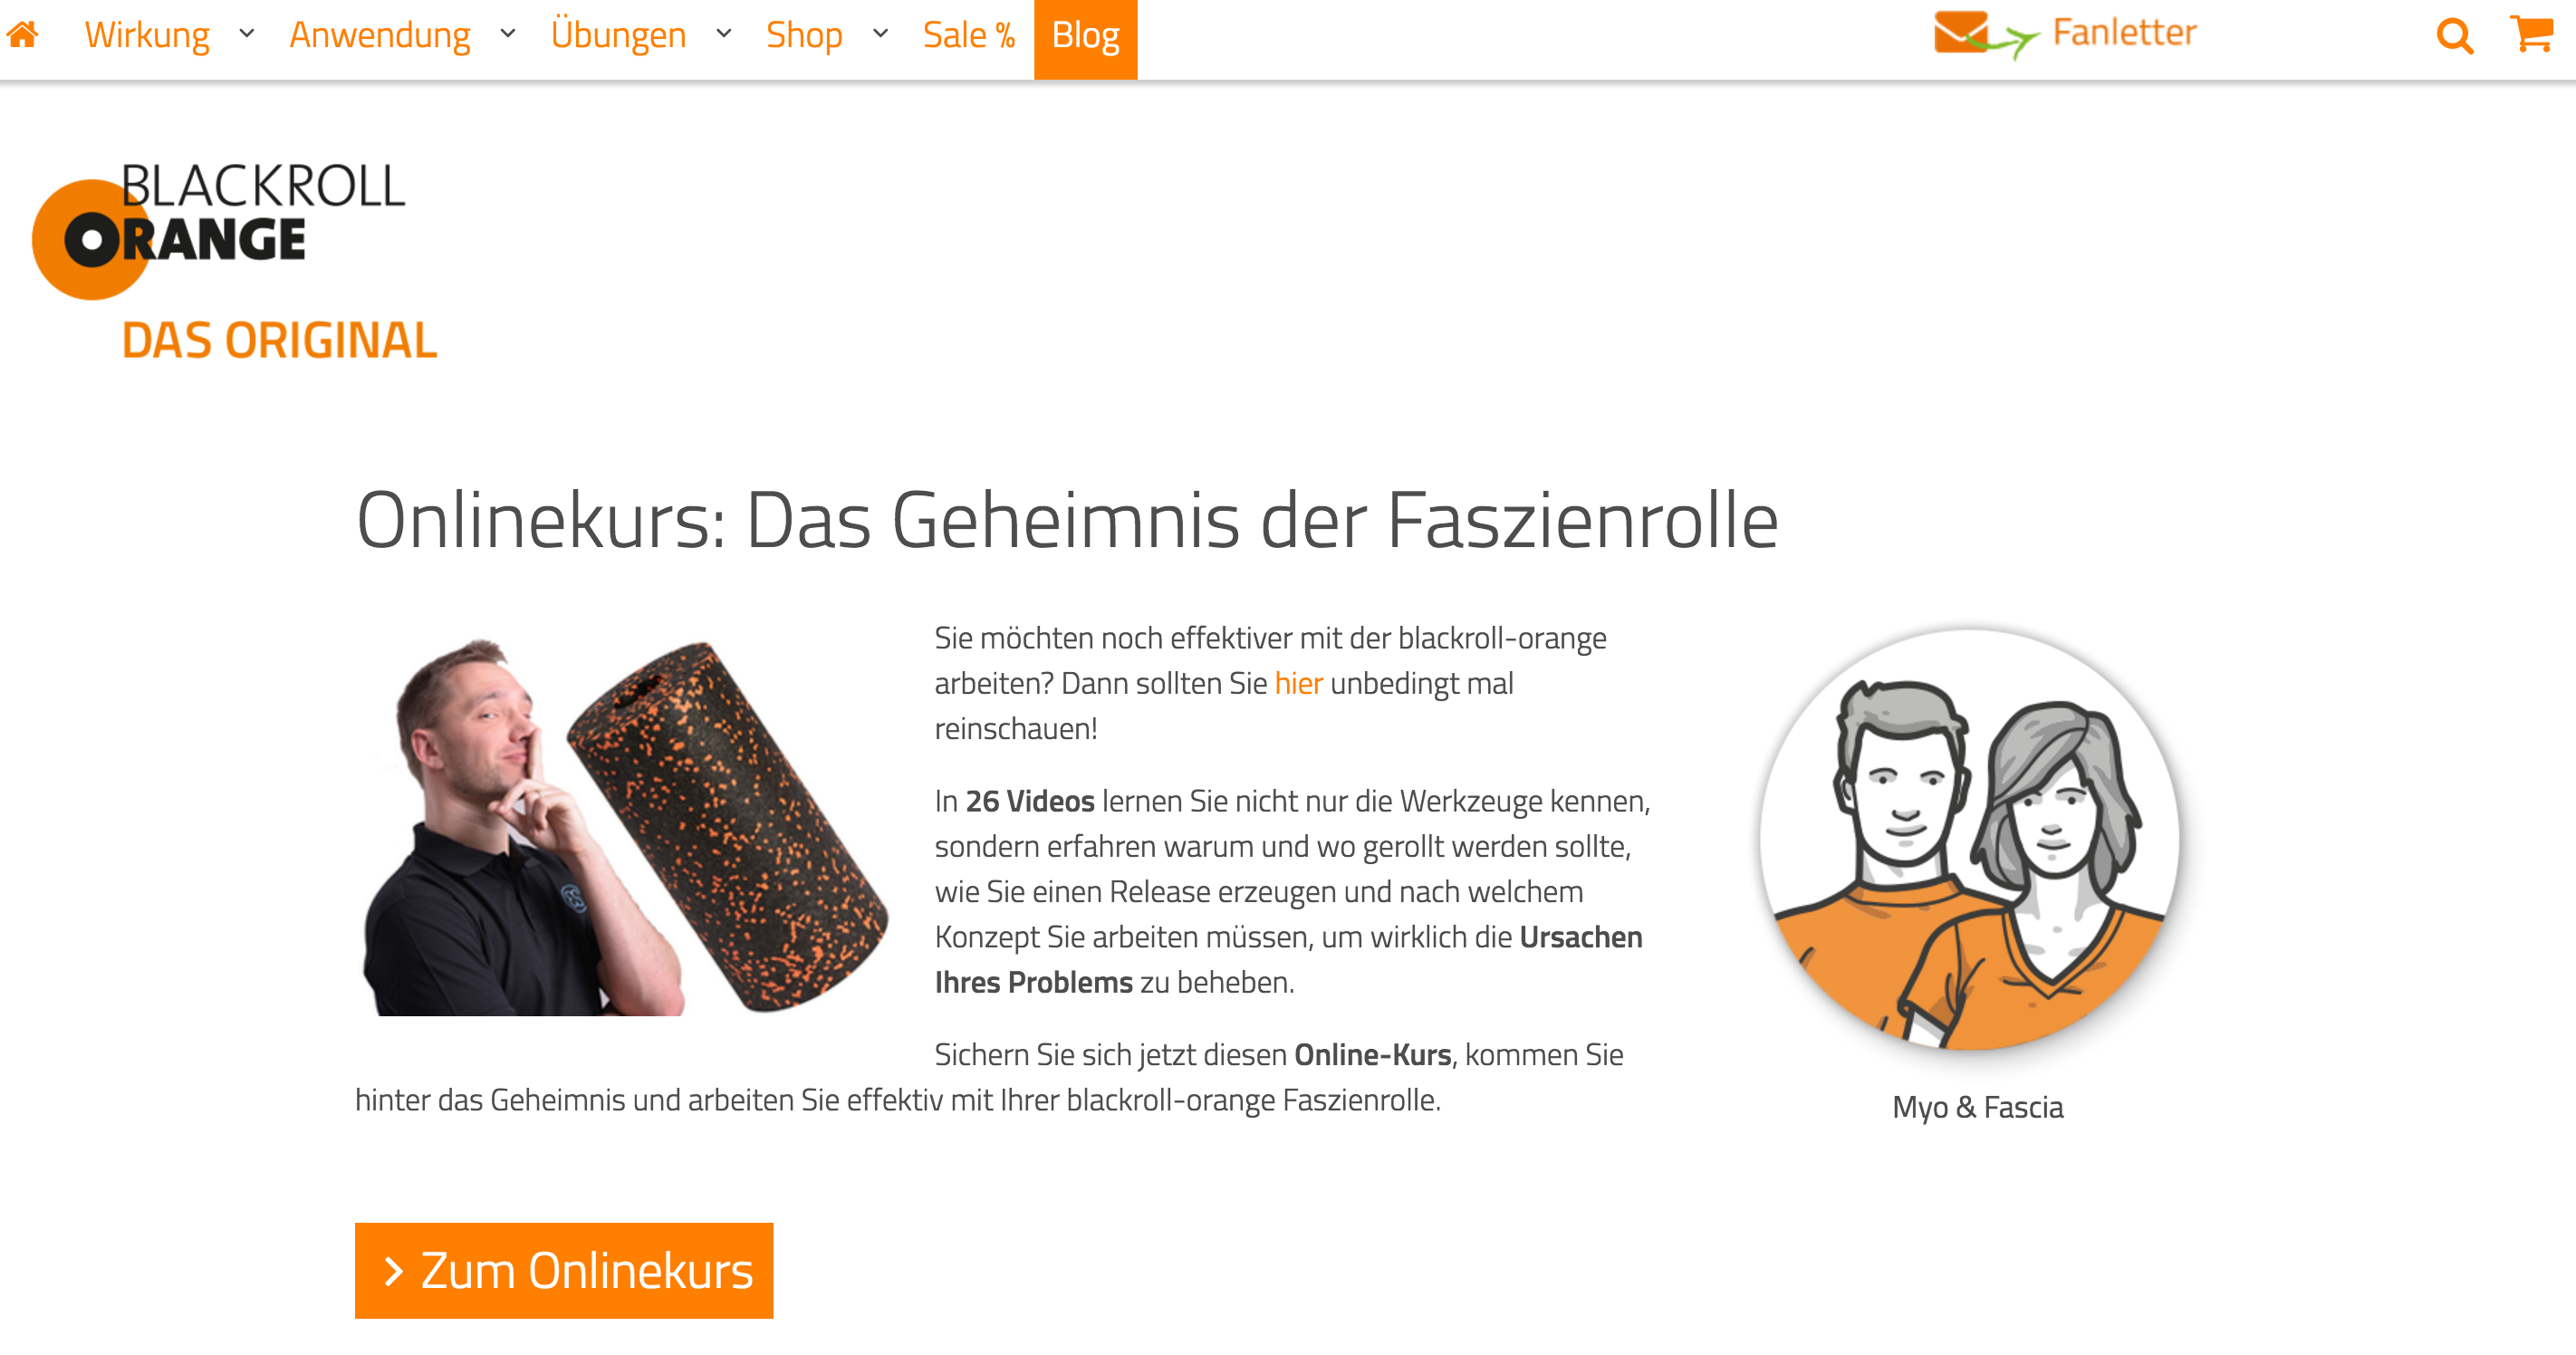 Blackroll Orange Faszien Dirk Beckmann